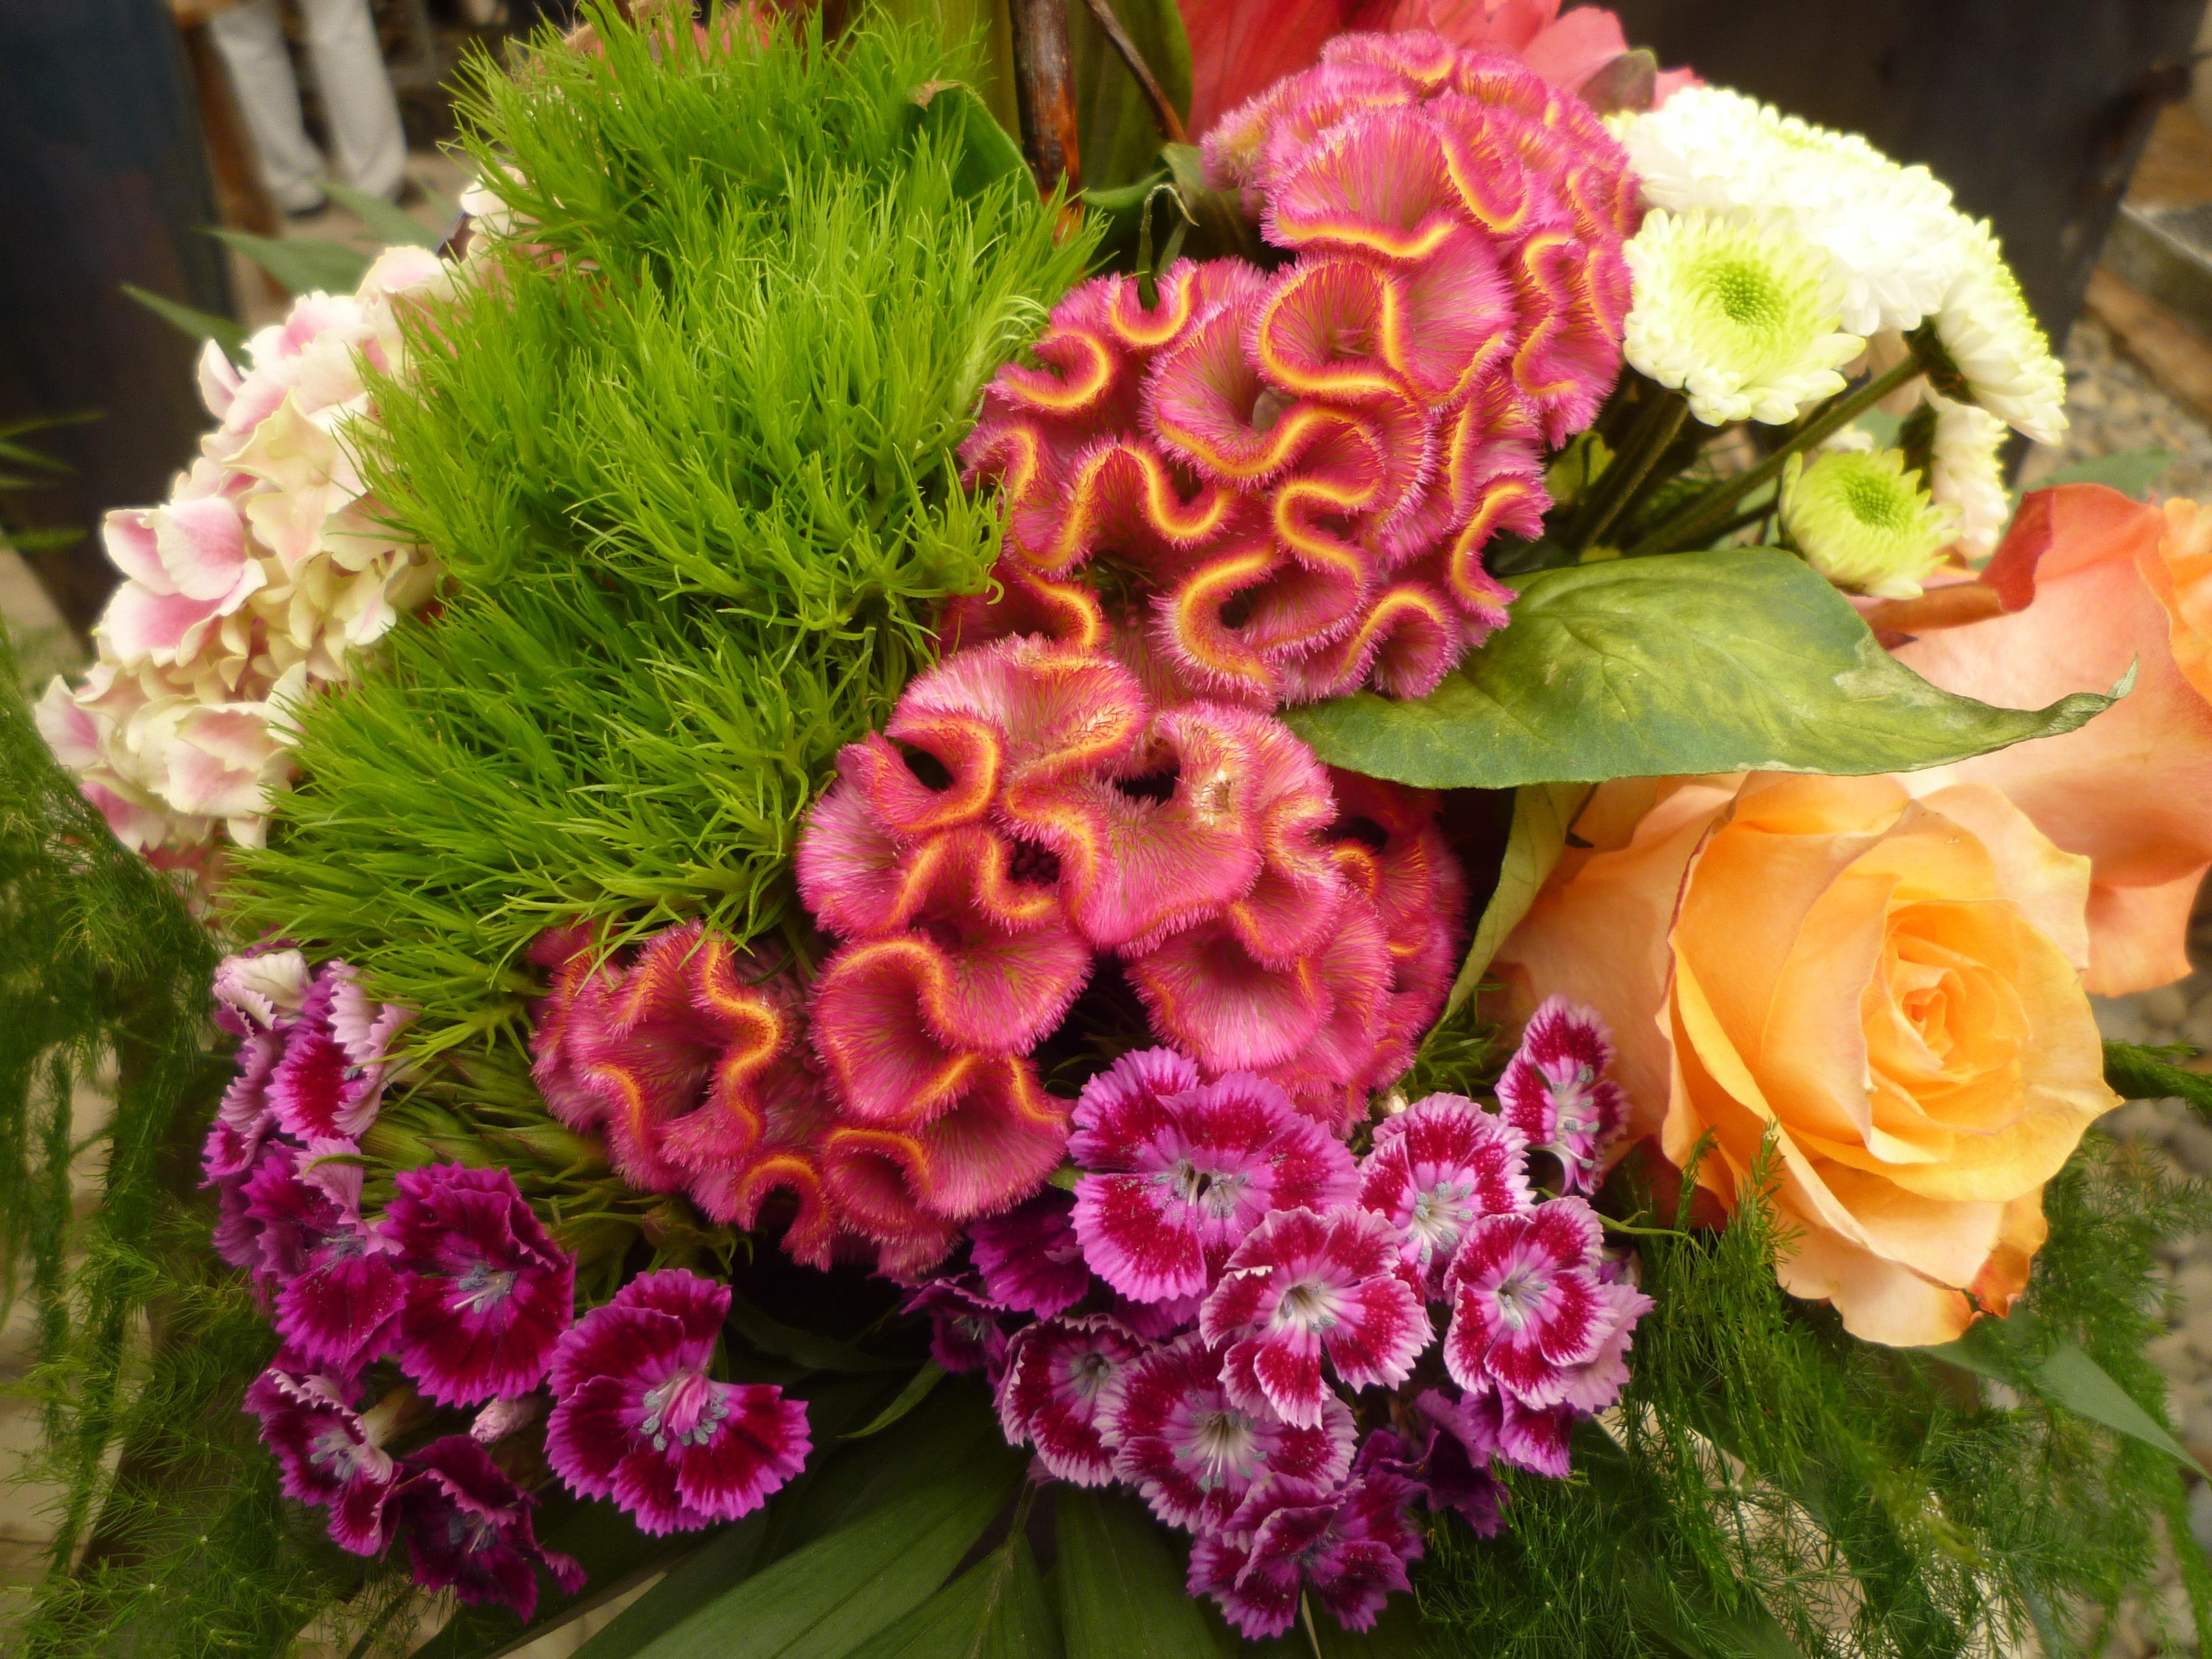 Free Images : colorful, flora, floristry, retail, cloves, floral ...